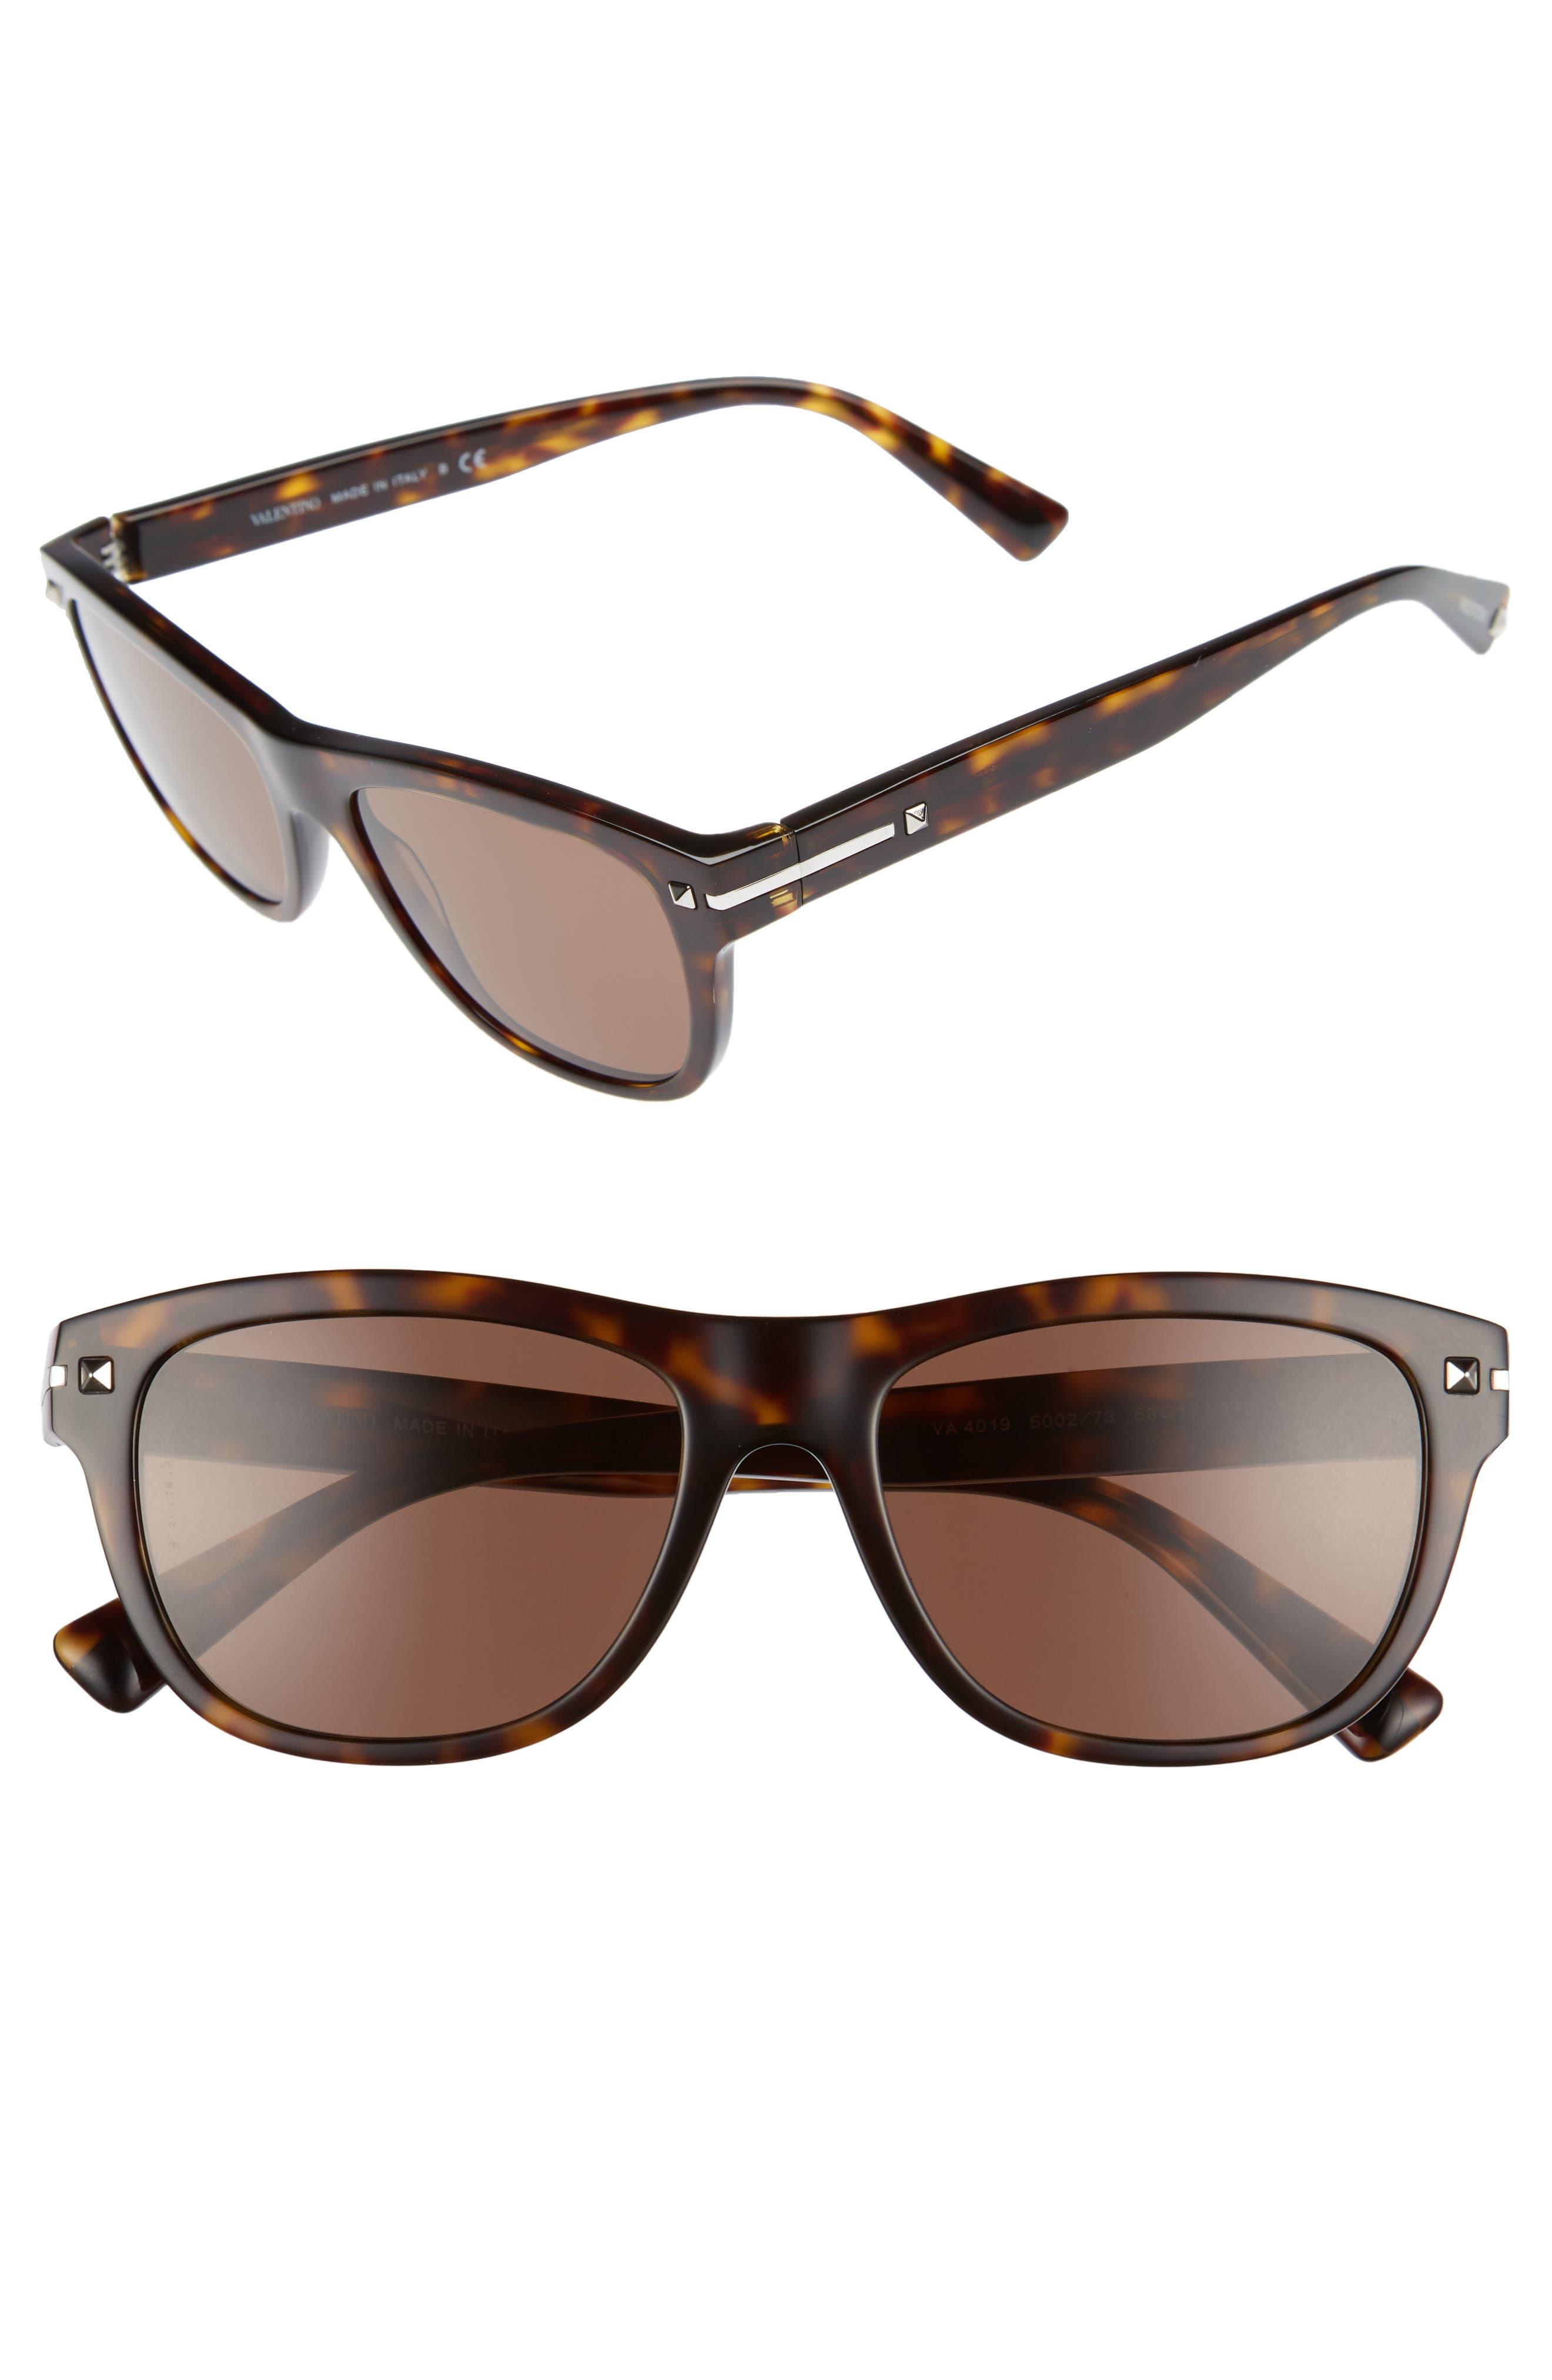 53mm Sunglasses,                         Main,                         color, Brown/ Havana